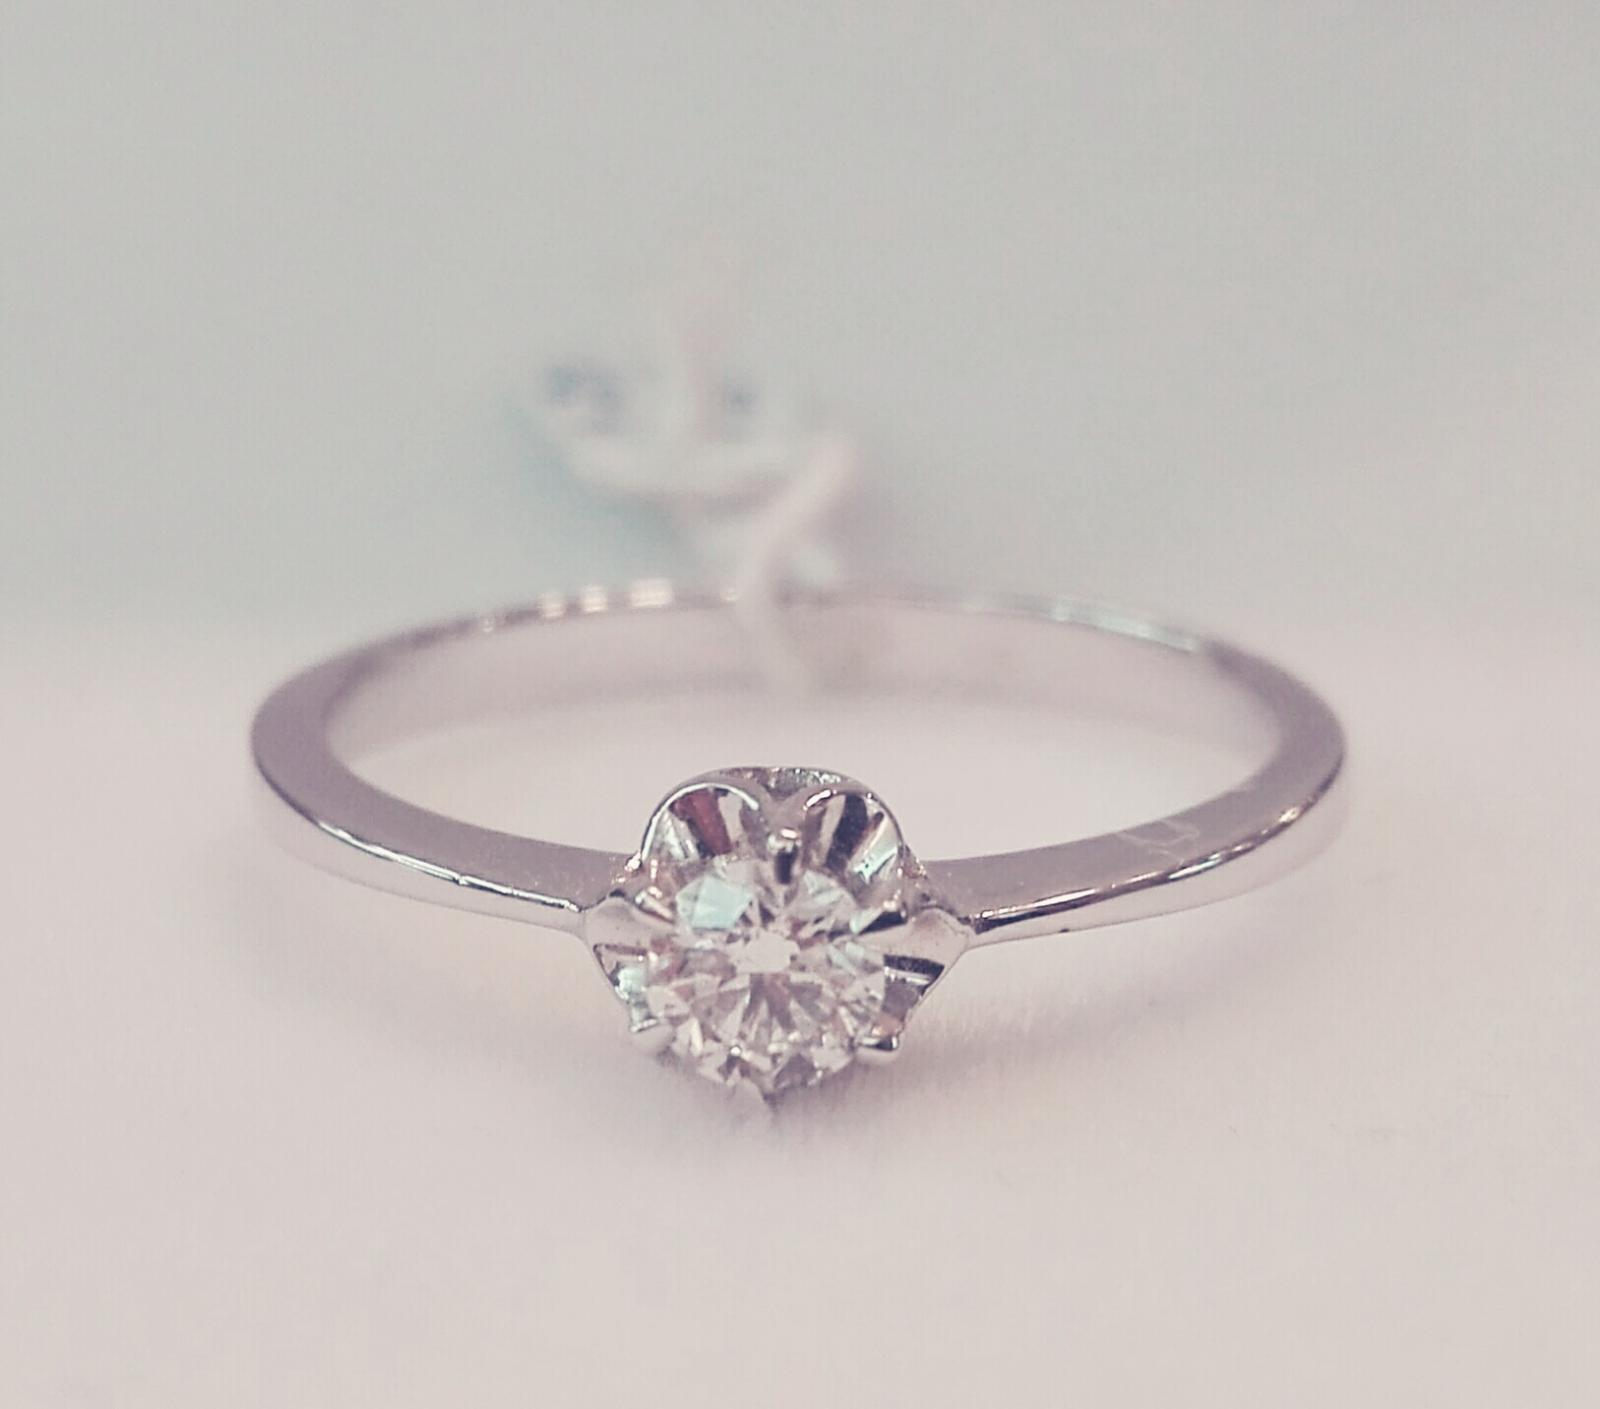 Anillo Diamantes Mujer Solitario Con Garras Oro Blanco 18 Quilates